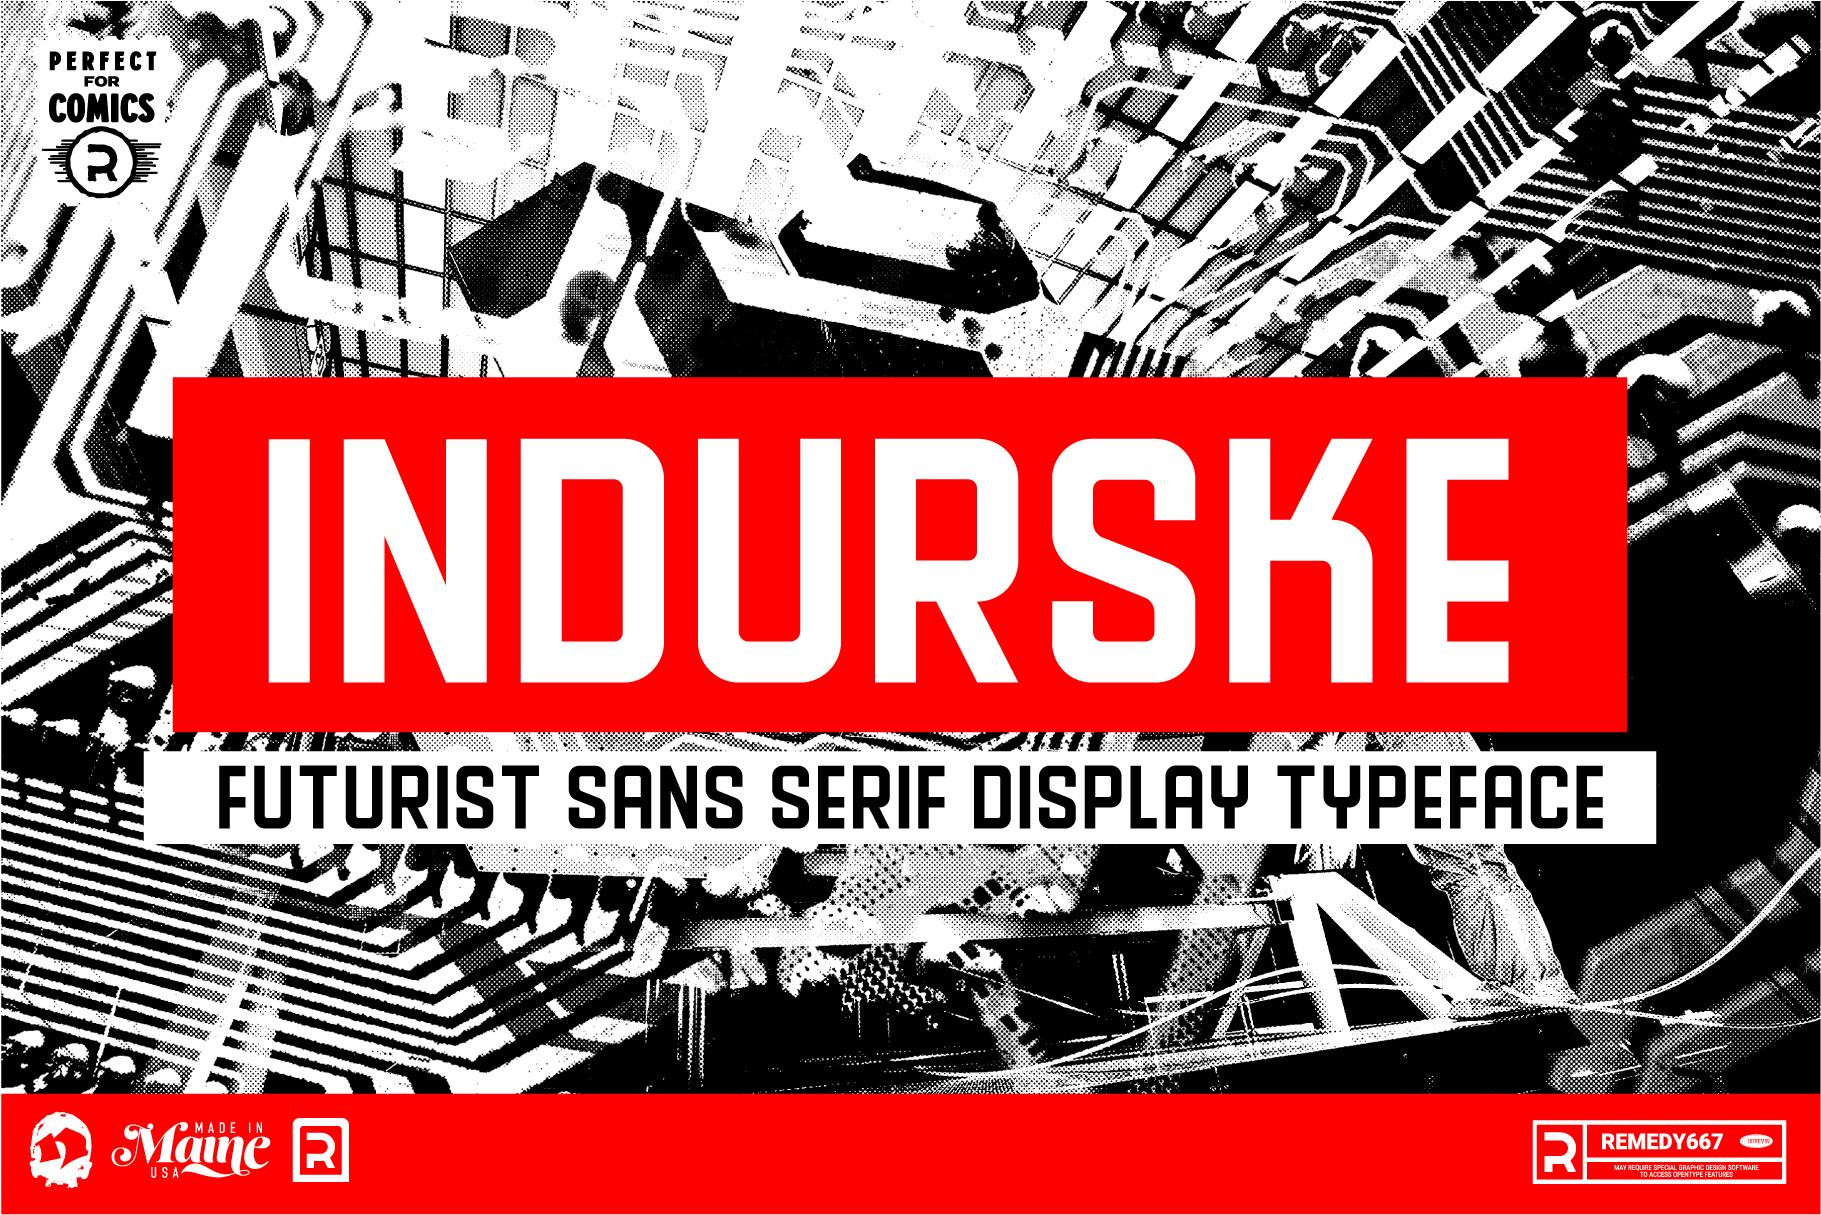 Indurske - Futurist Sans Serif Display Typeface from Remedy667